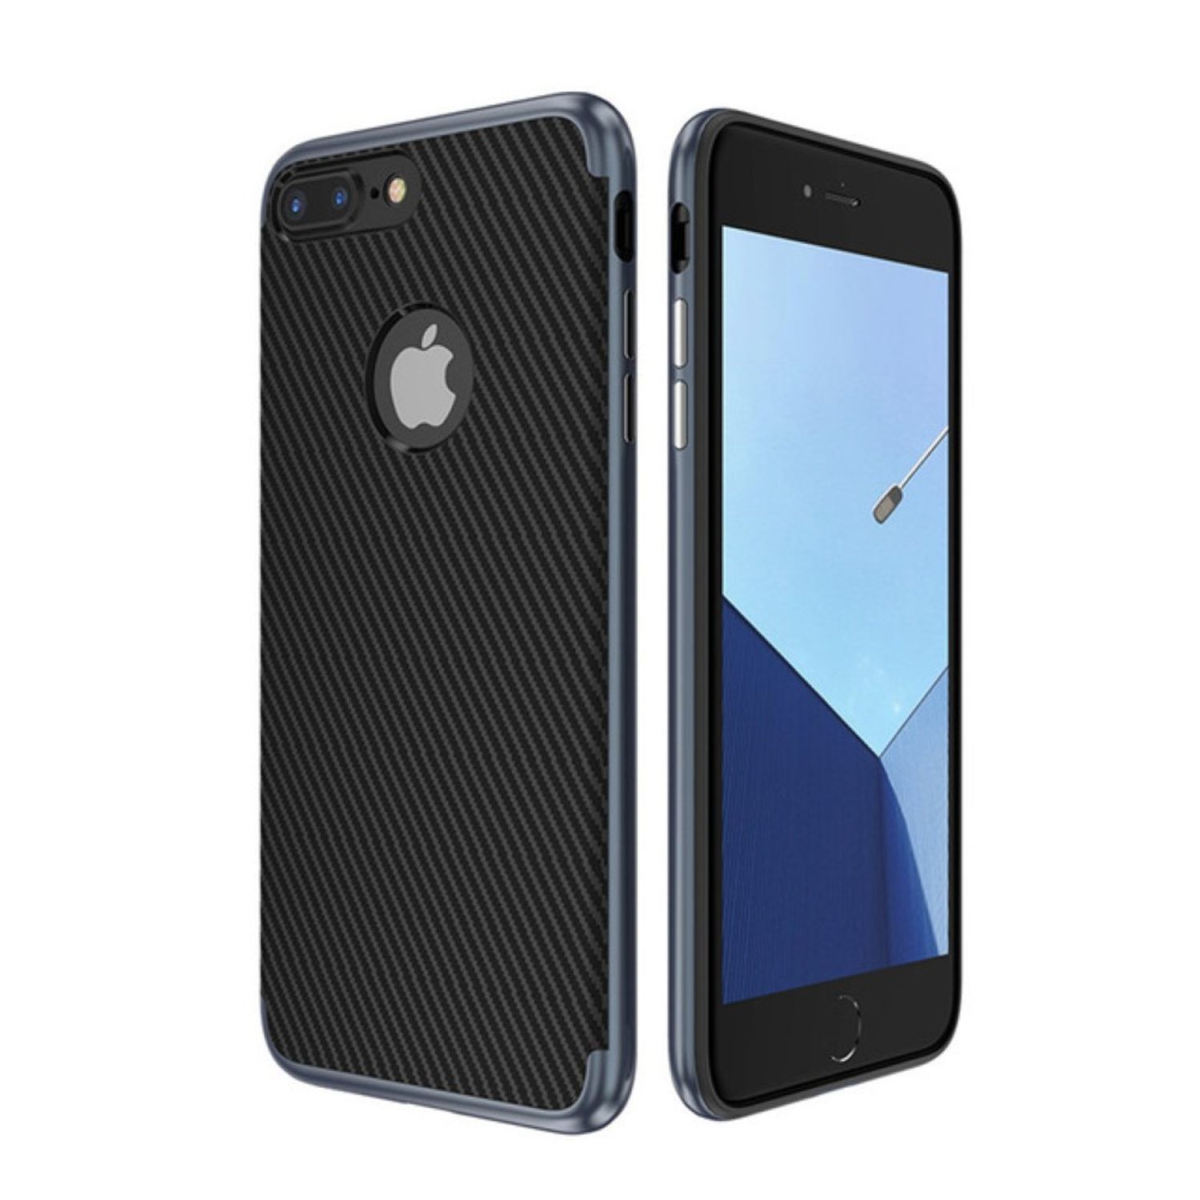 hybrid silikon handy h lle f r apple iphone 7 plus case. Black Bedroom Furniture Sets. Home Design Ideas